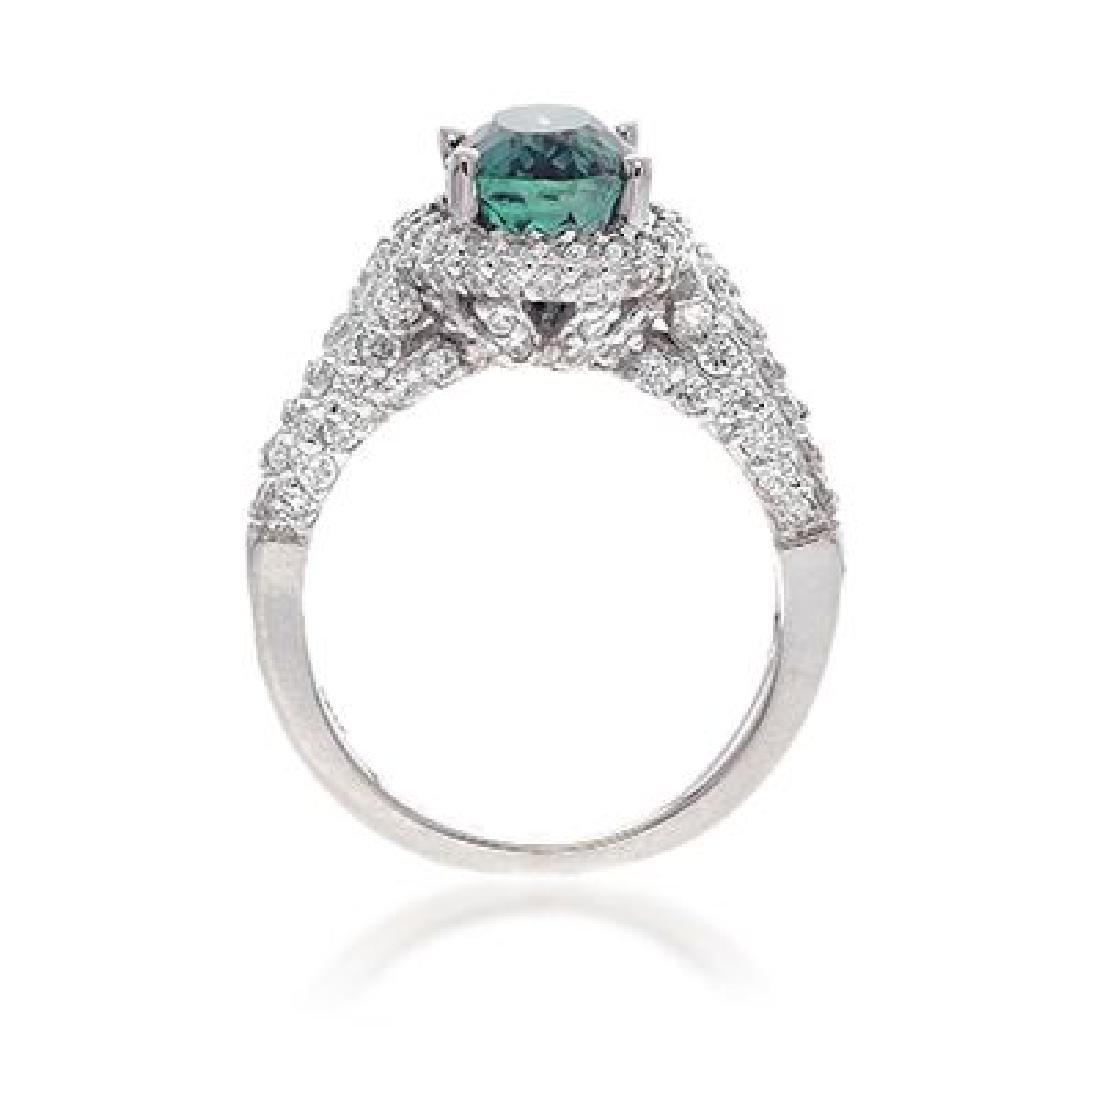 C.DUNAIGRE ALEXANDRITE RING WITH DIAMOND - 2